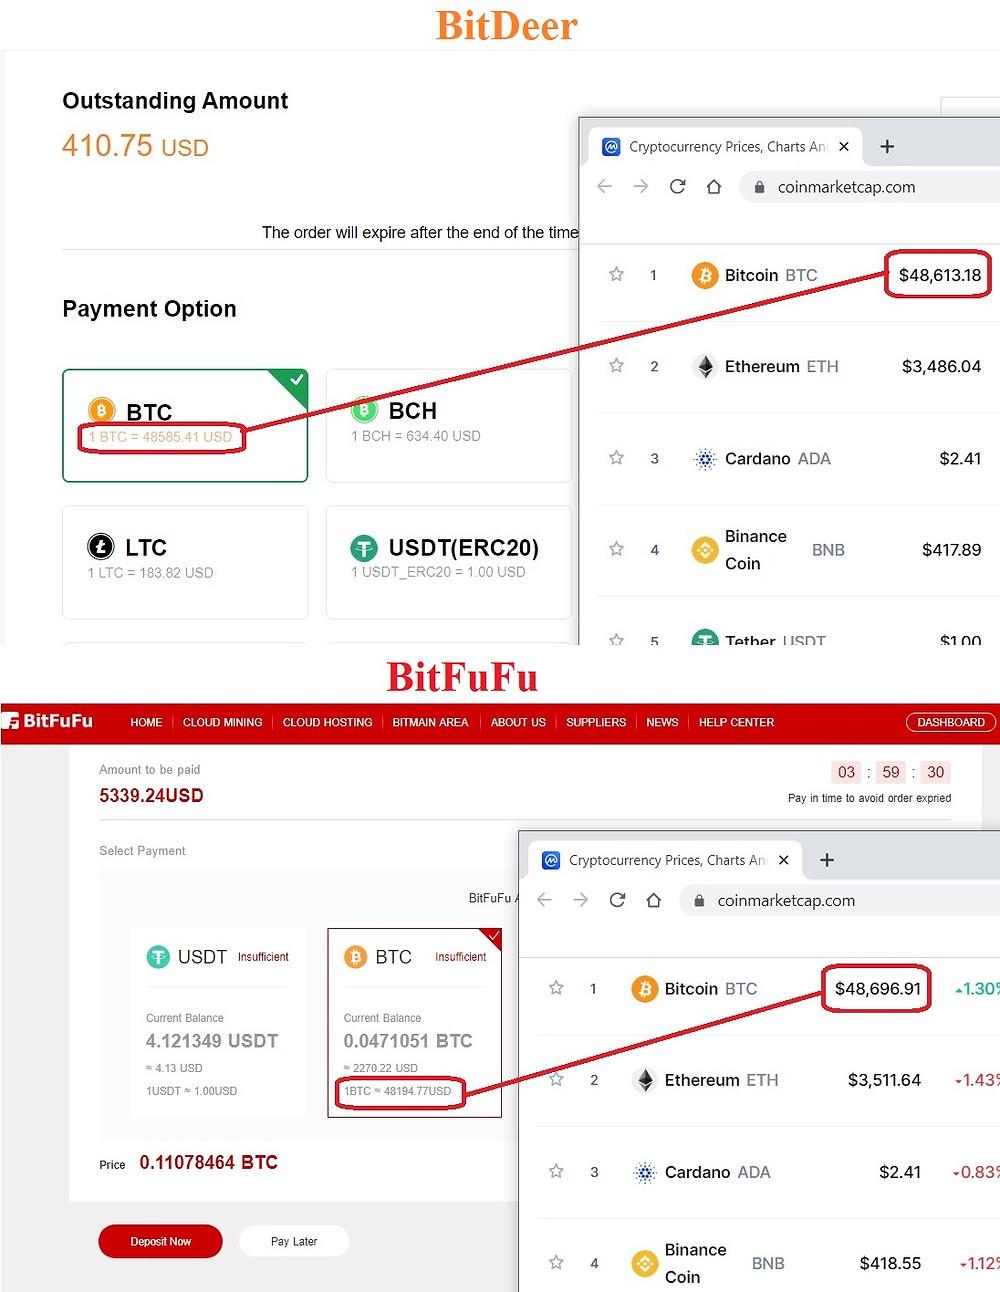 Internal BTC Rate (BitDeer vs BitFuFu)